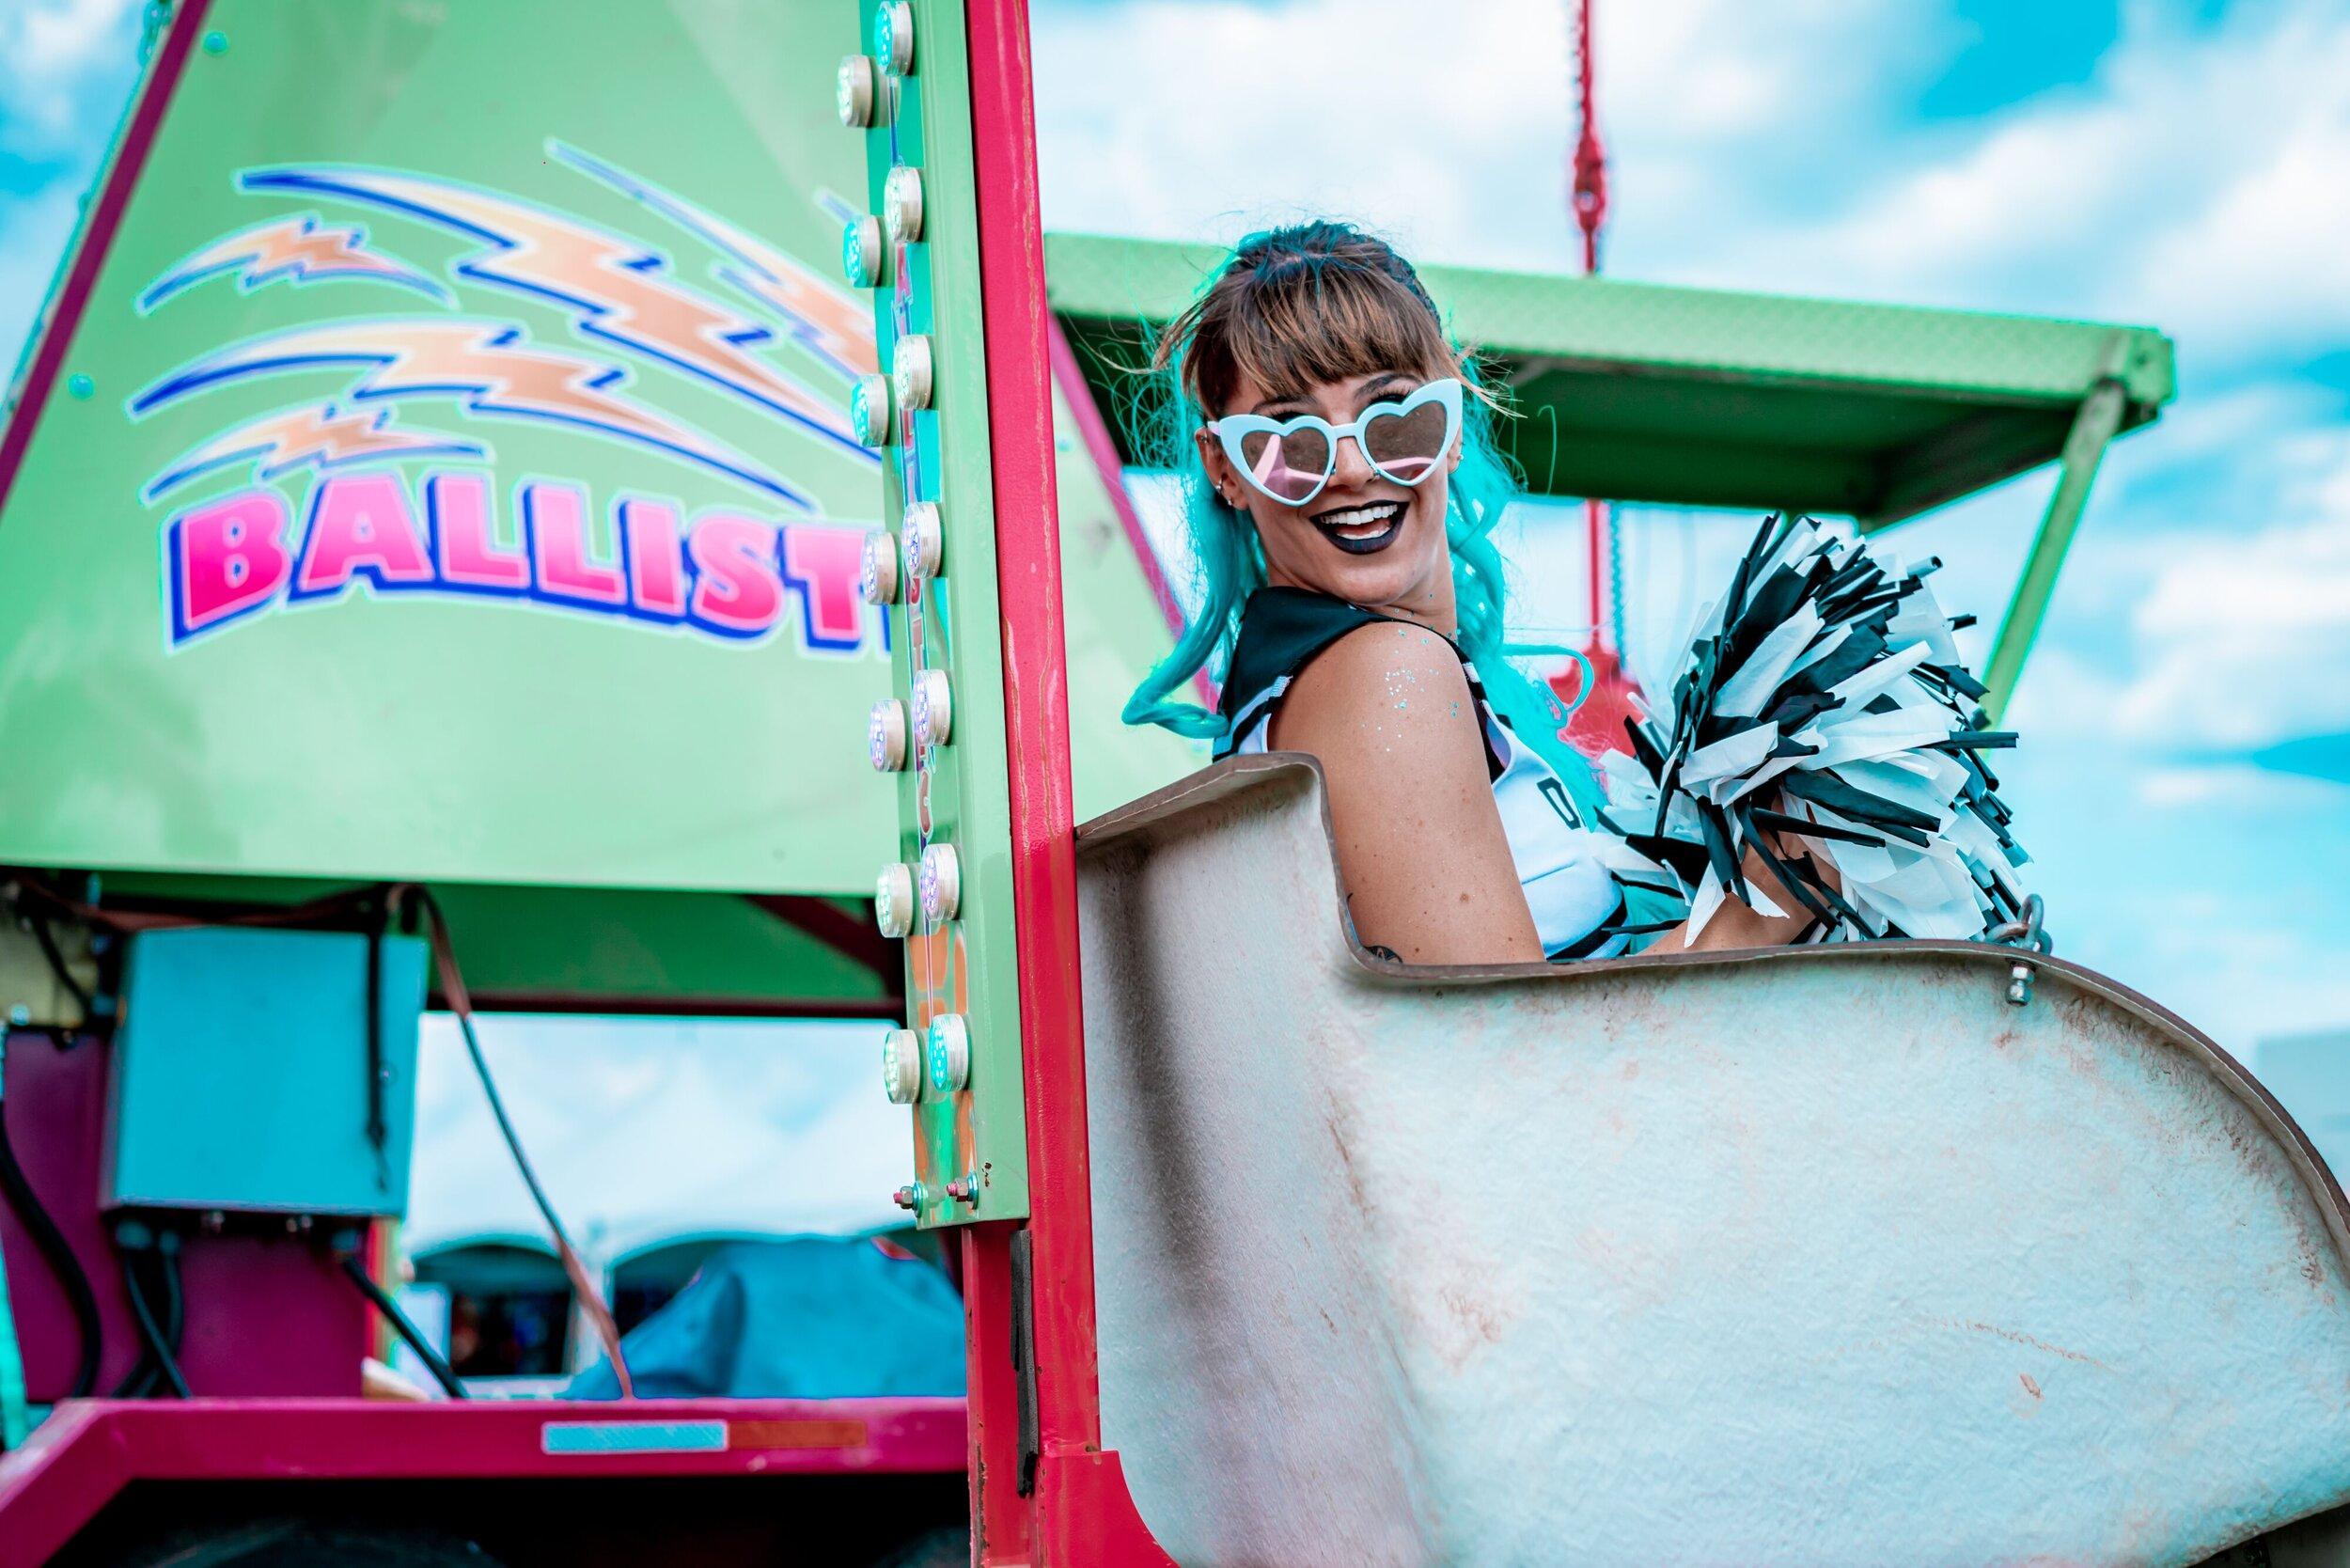 Dirtybird Cheerleaders go for a carnival ride